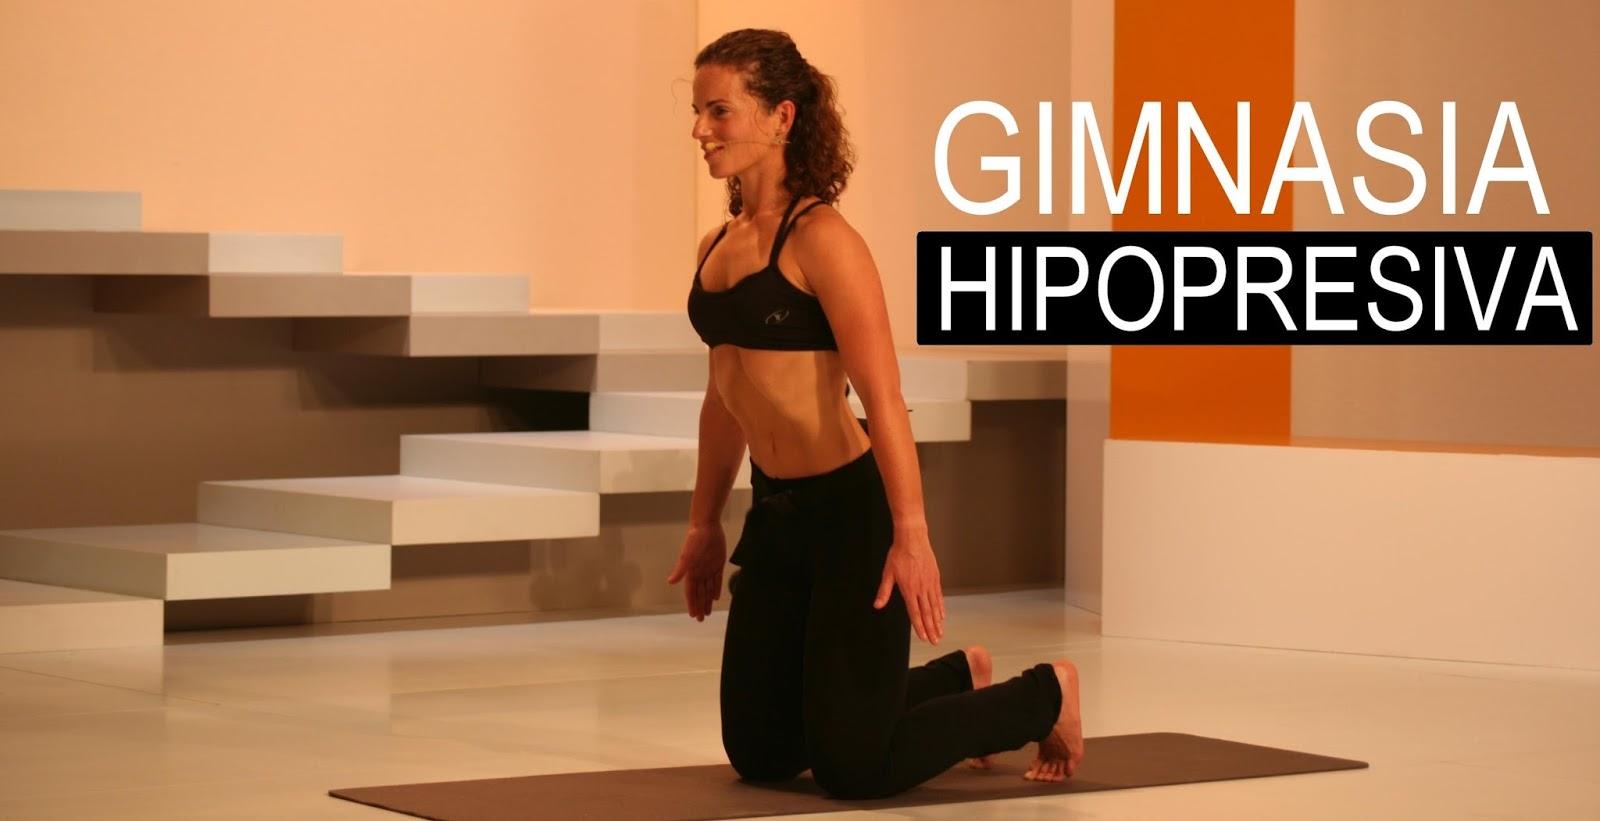 Gimnasia abdominal hipopresiva beneficios